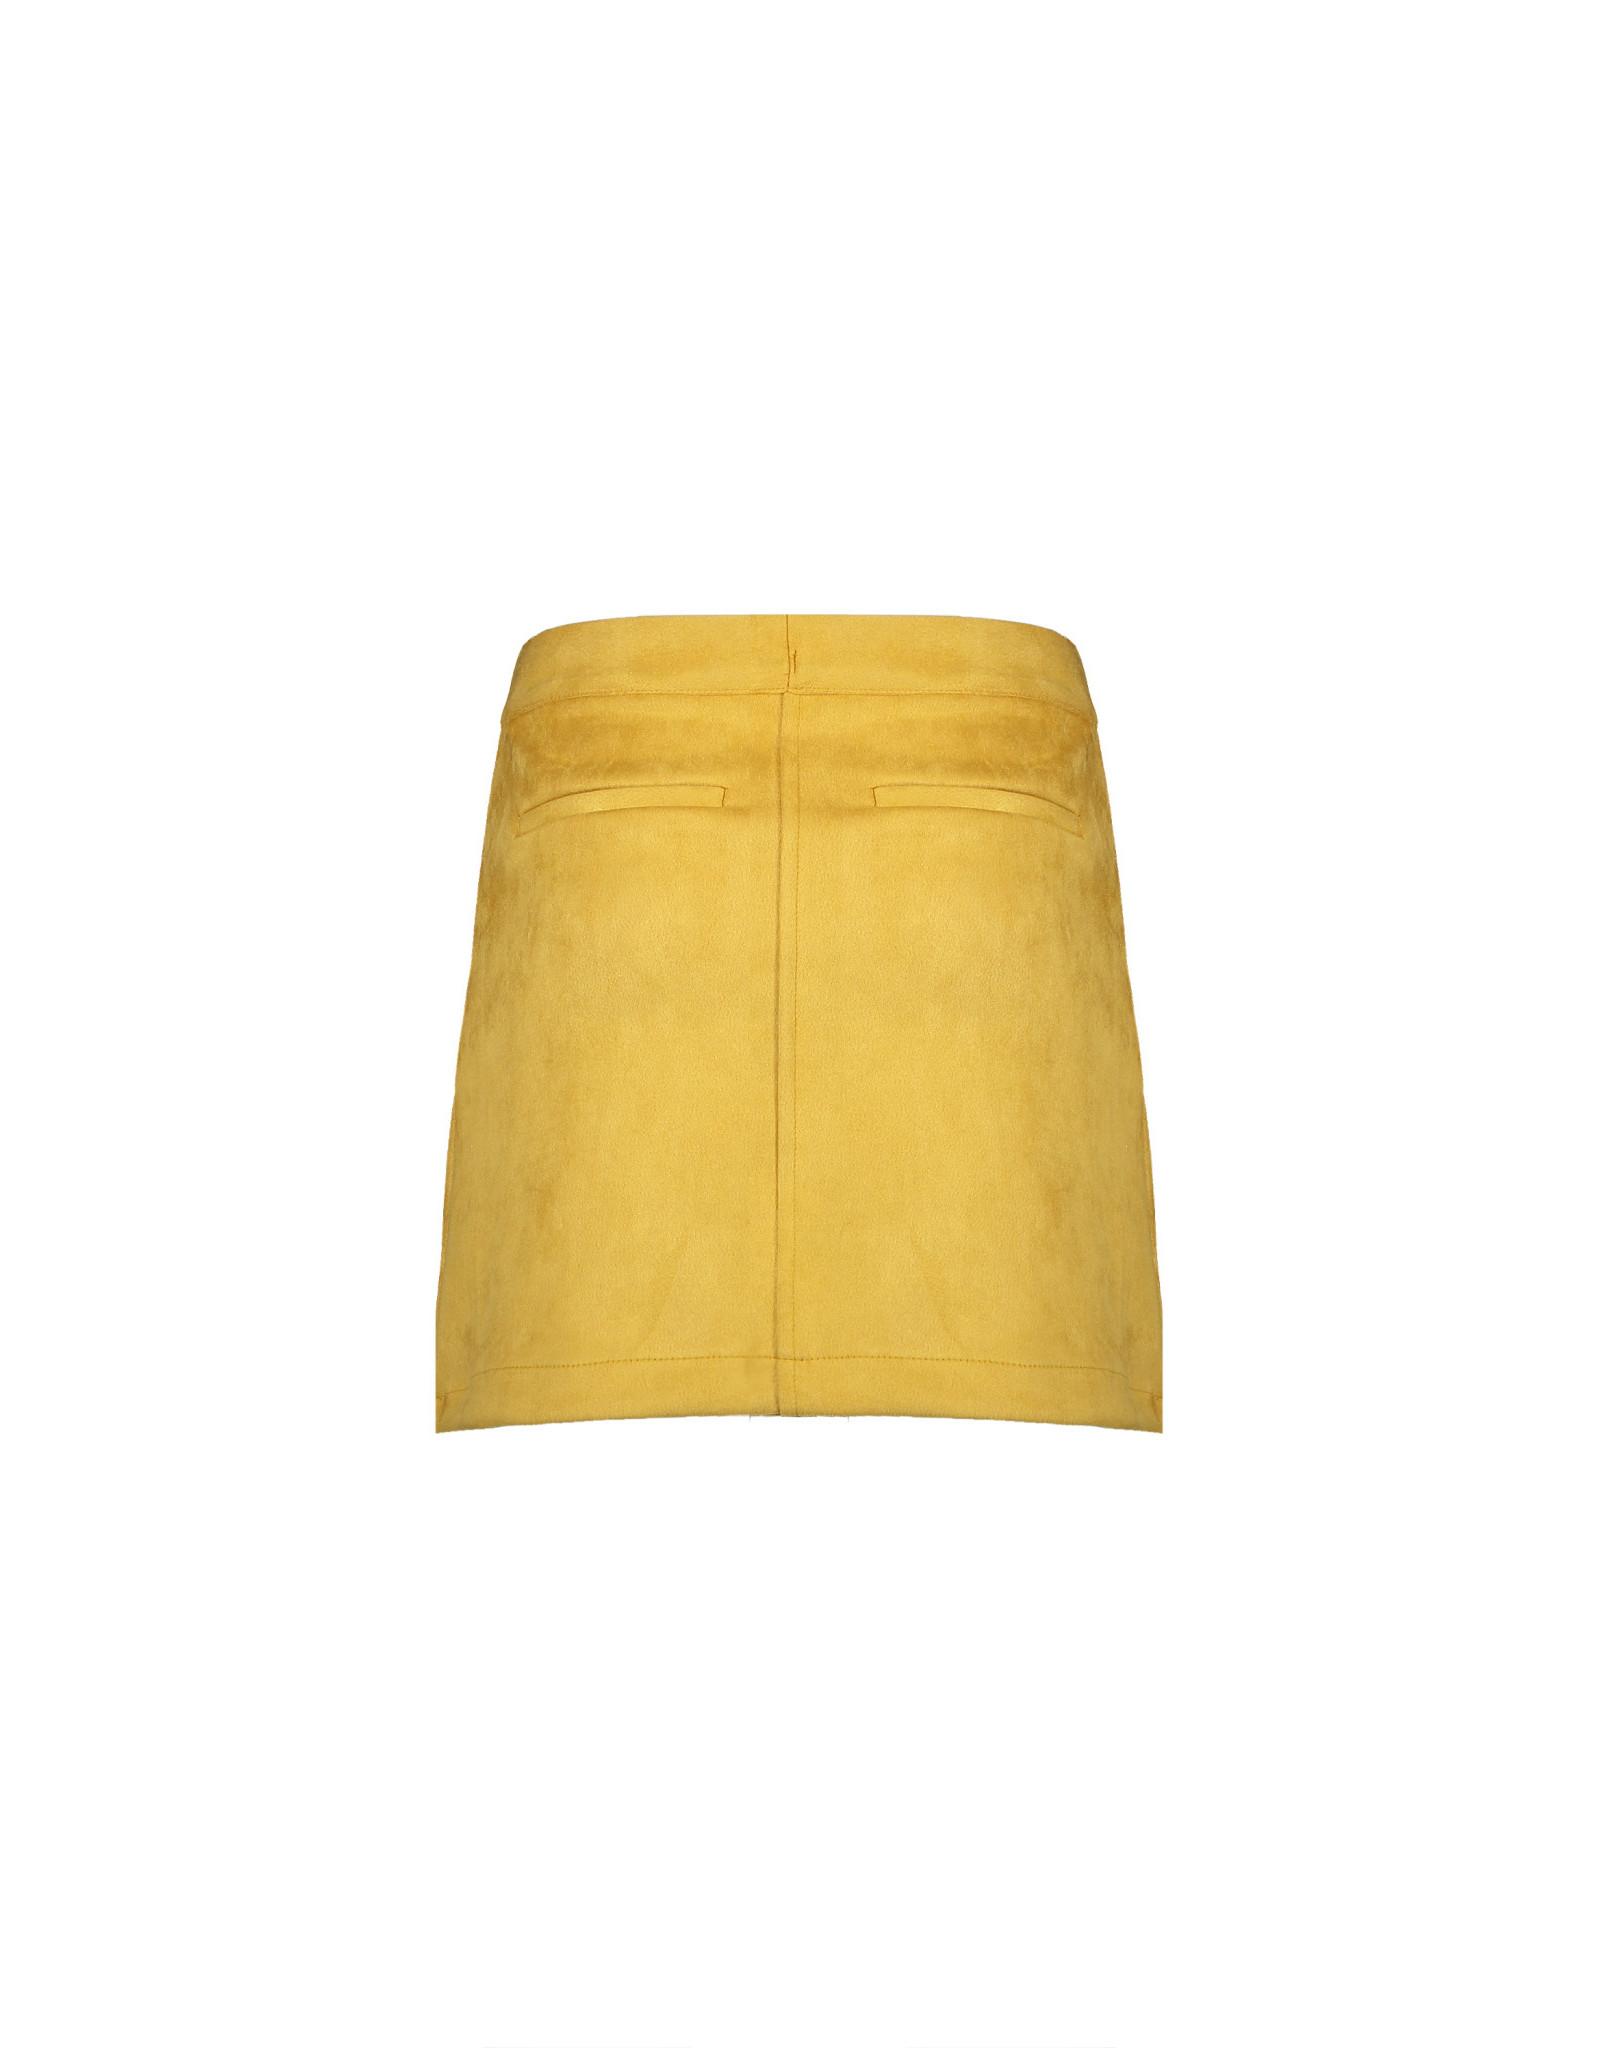 NoBell meiden suede rok NishaB Yellow Gold